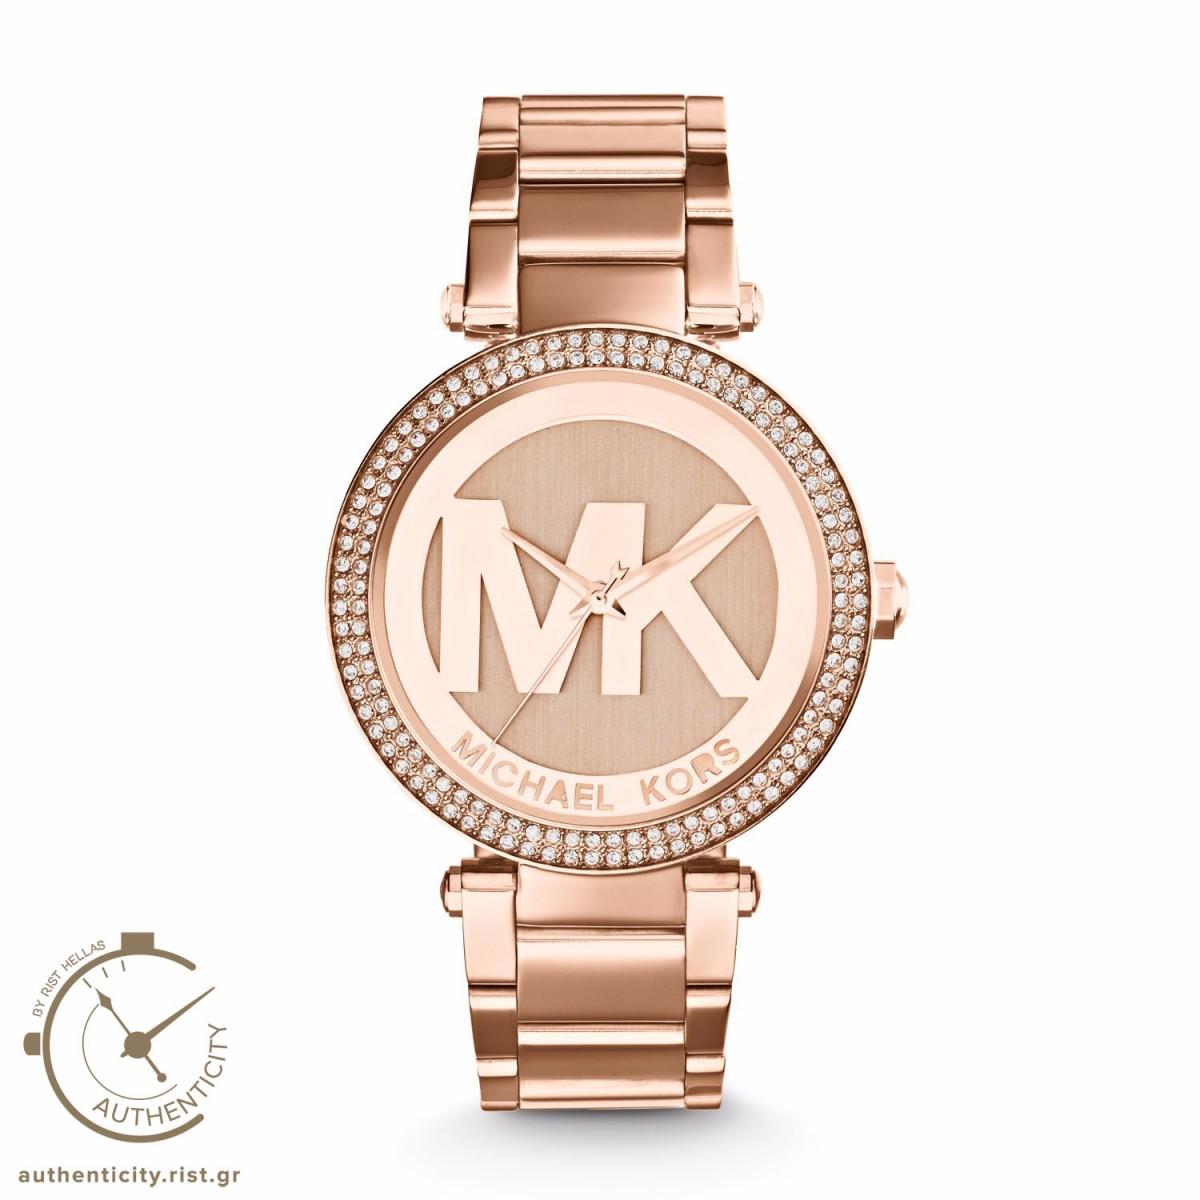 9e9d9a5b009 Ρολόι Michael Kors Parker MK5865